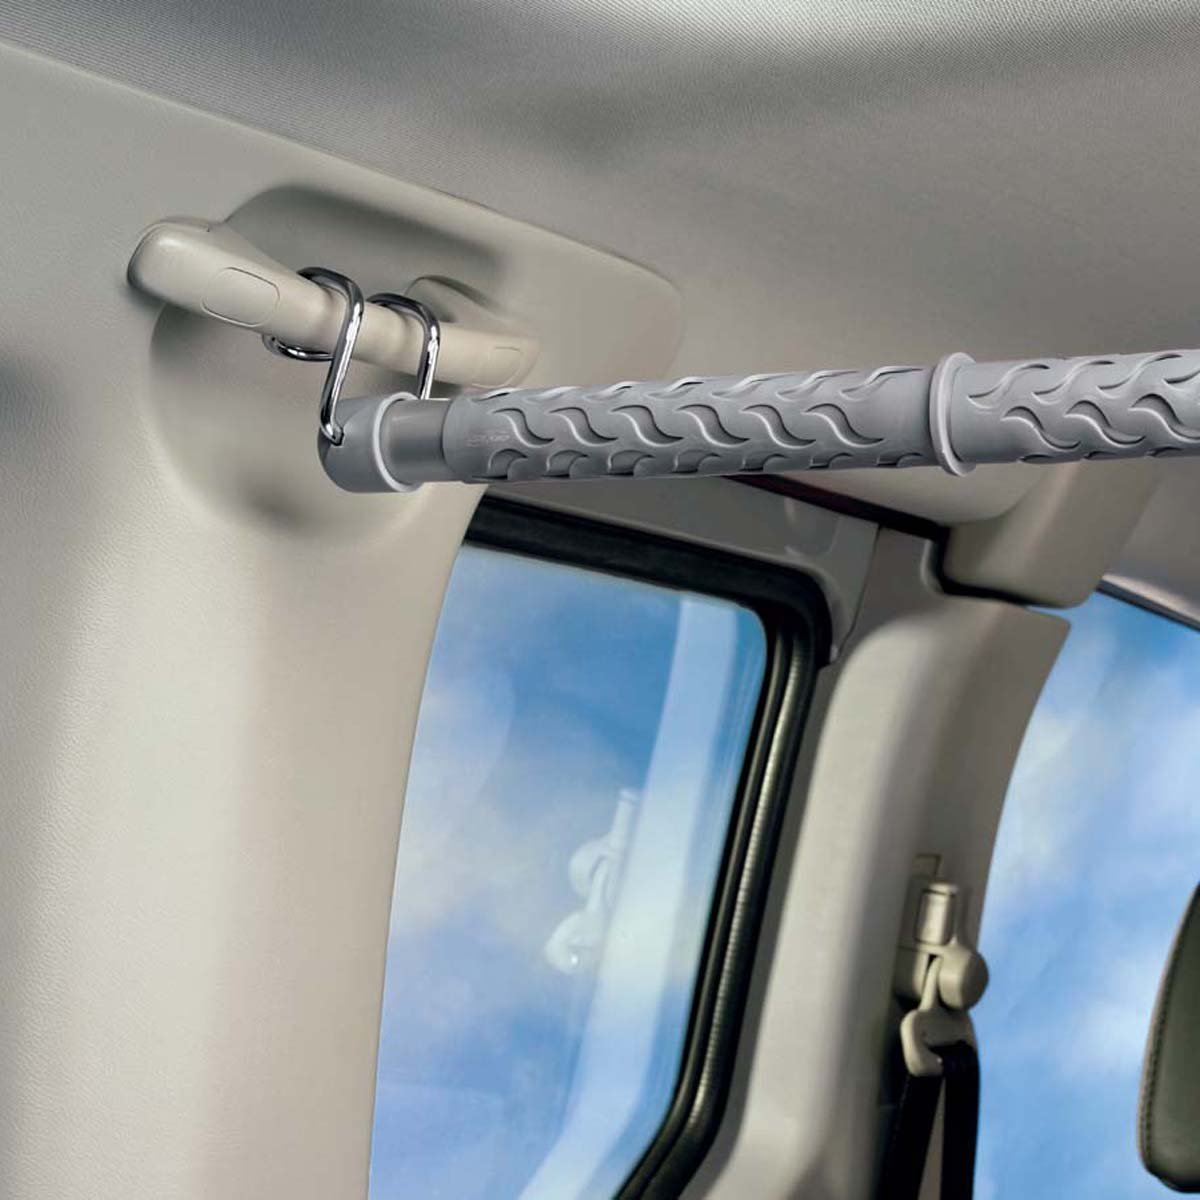 amazon com high road heavy duty expandable car clothes hanger bar